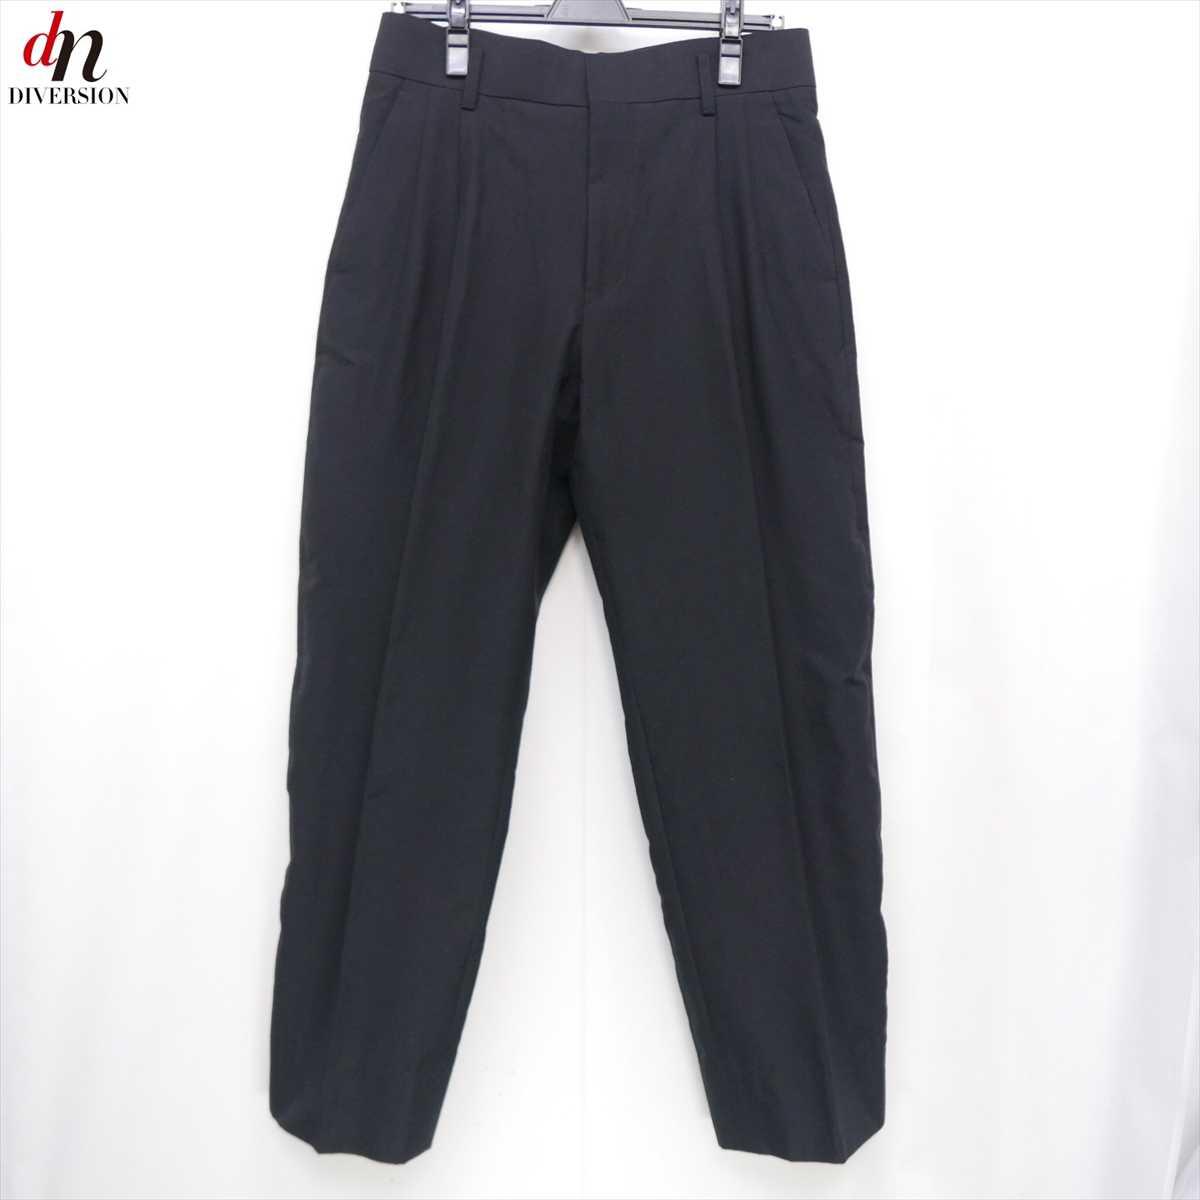 18SS The Letters ザ レターズ High Waisted Trousers OX キュプラ混 コットン ハイウエスト トラウザー パンツ BLACK S 【中古】 DNS-7206